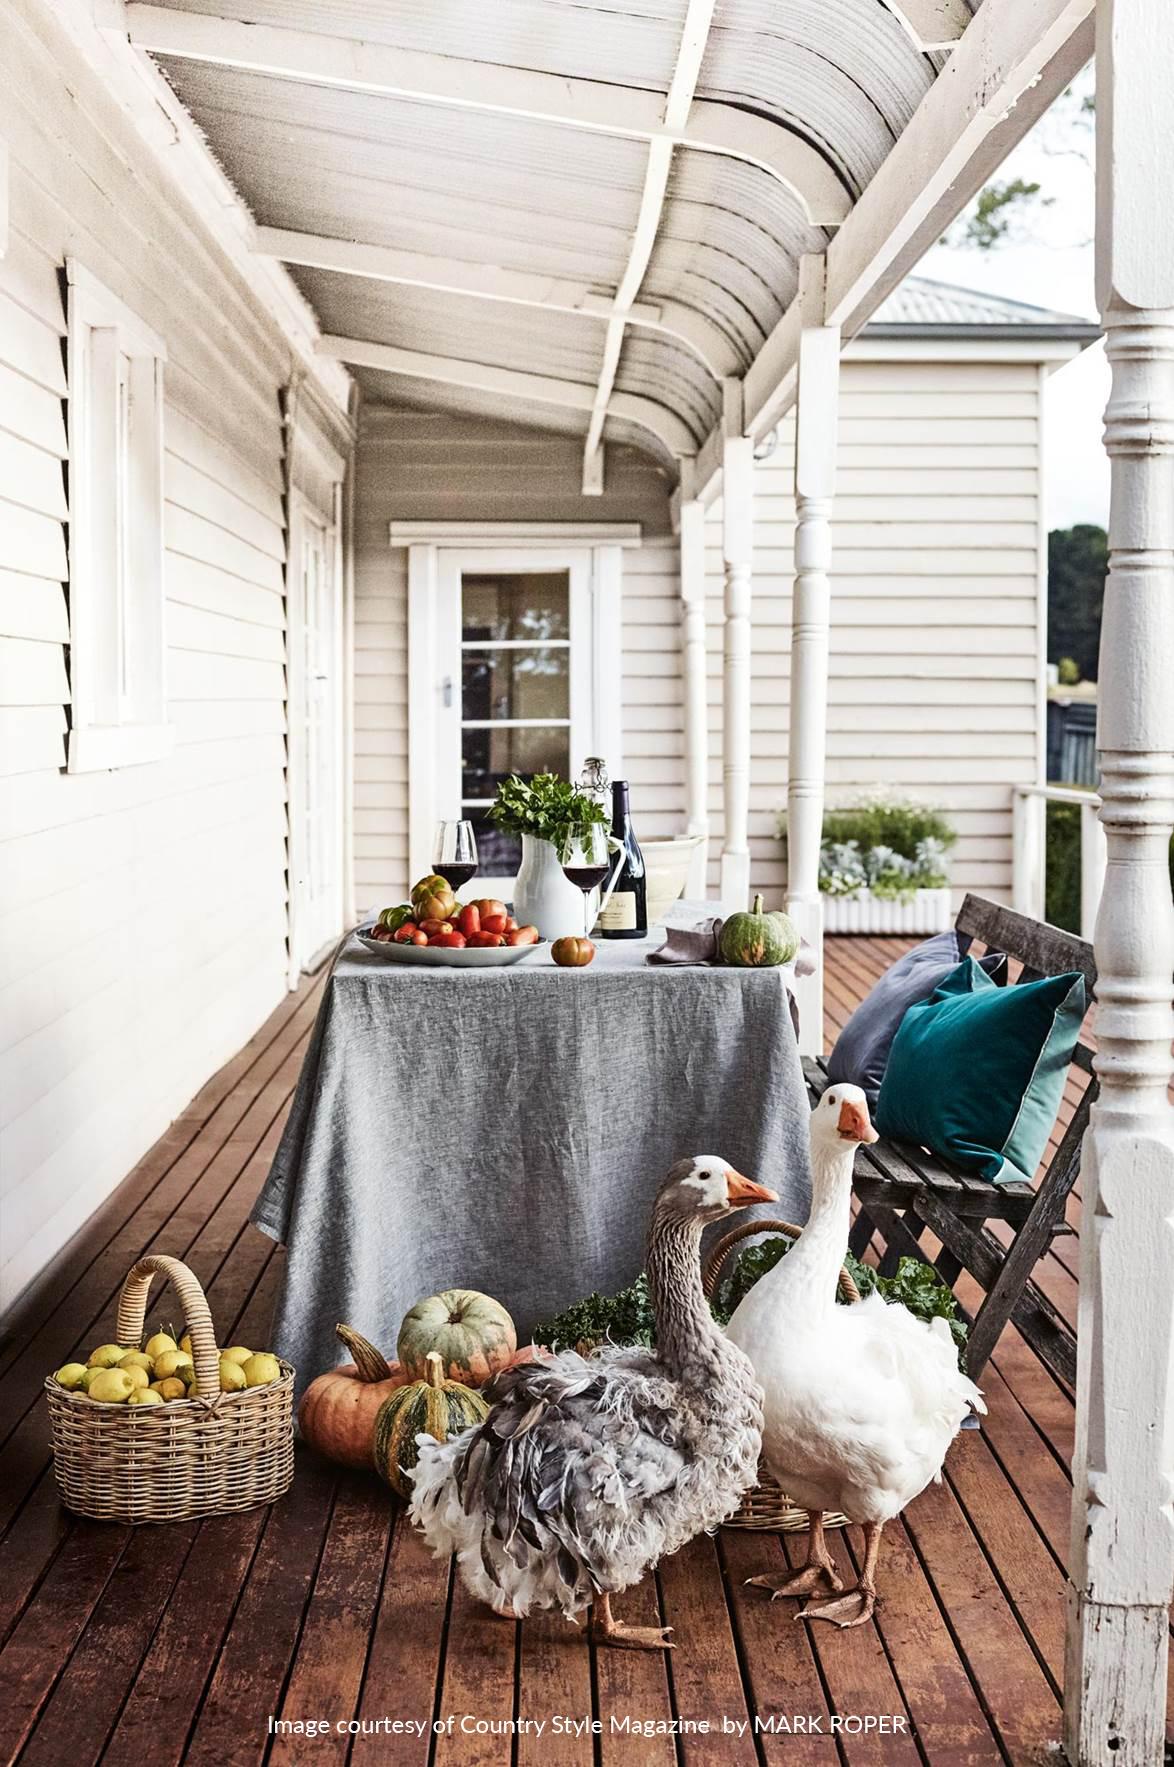 1534810412457_geese-verandah-dining-table-roper-blaylock-ACSJUN2018.jpg